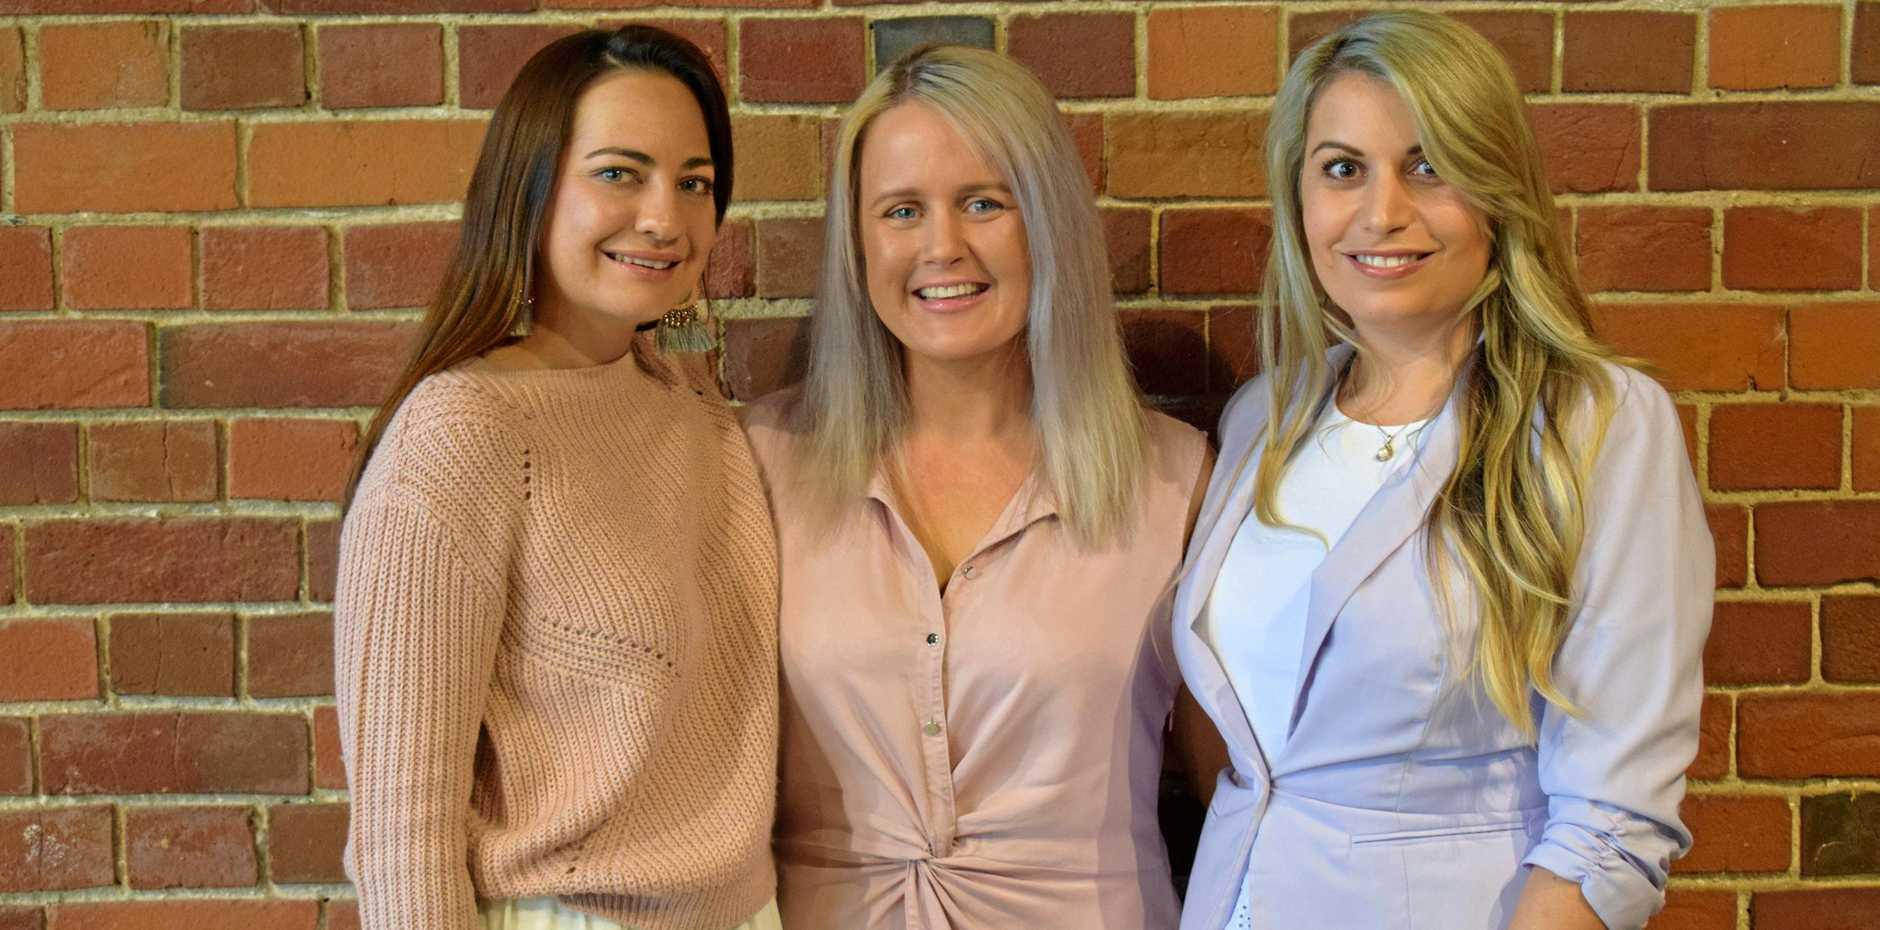 WOMEN TAKING CHARGE: Karine Davis, Beck Smith and Estella Davis are hosting a women in business event next month at Headrick's Lane.